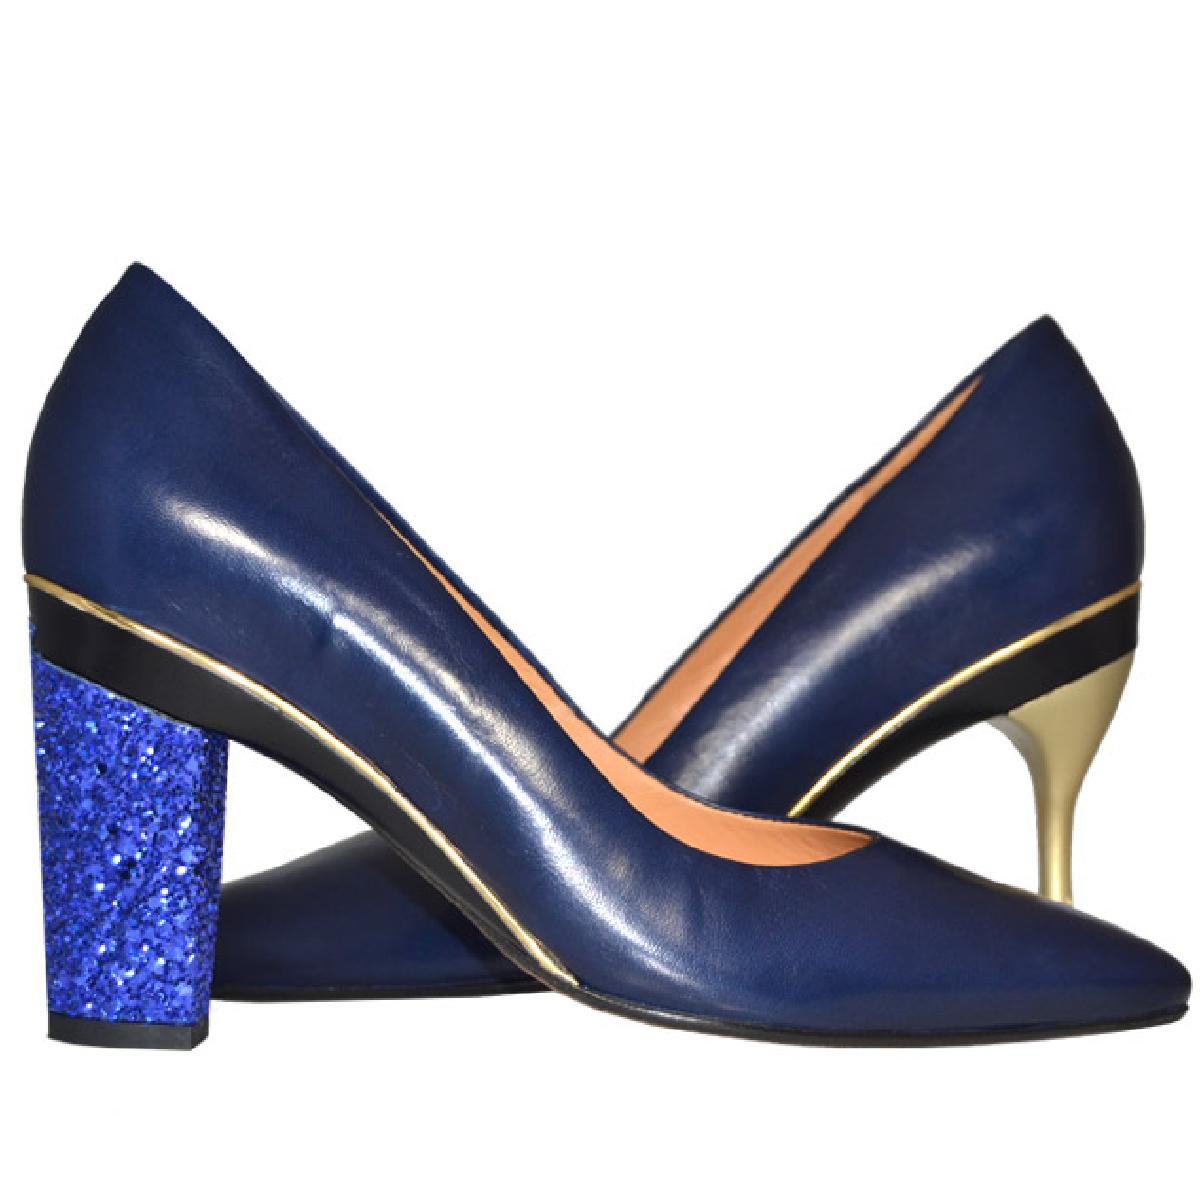 Chaussures Tanya Heath avec talons interchangeables.